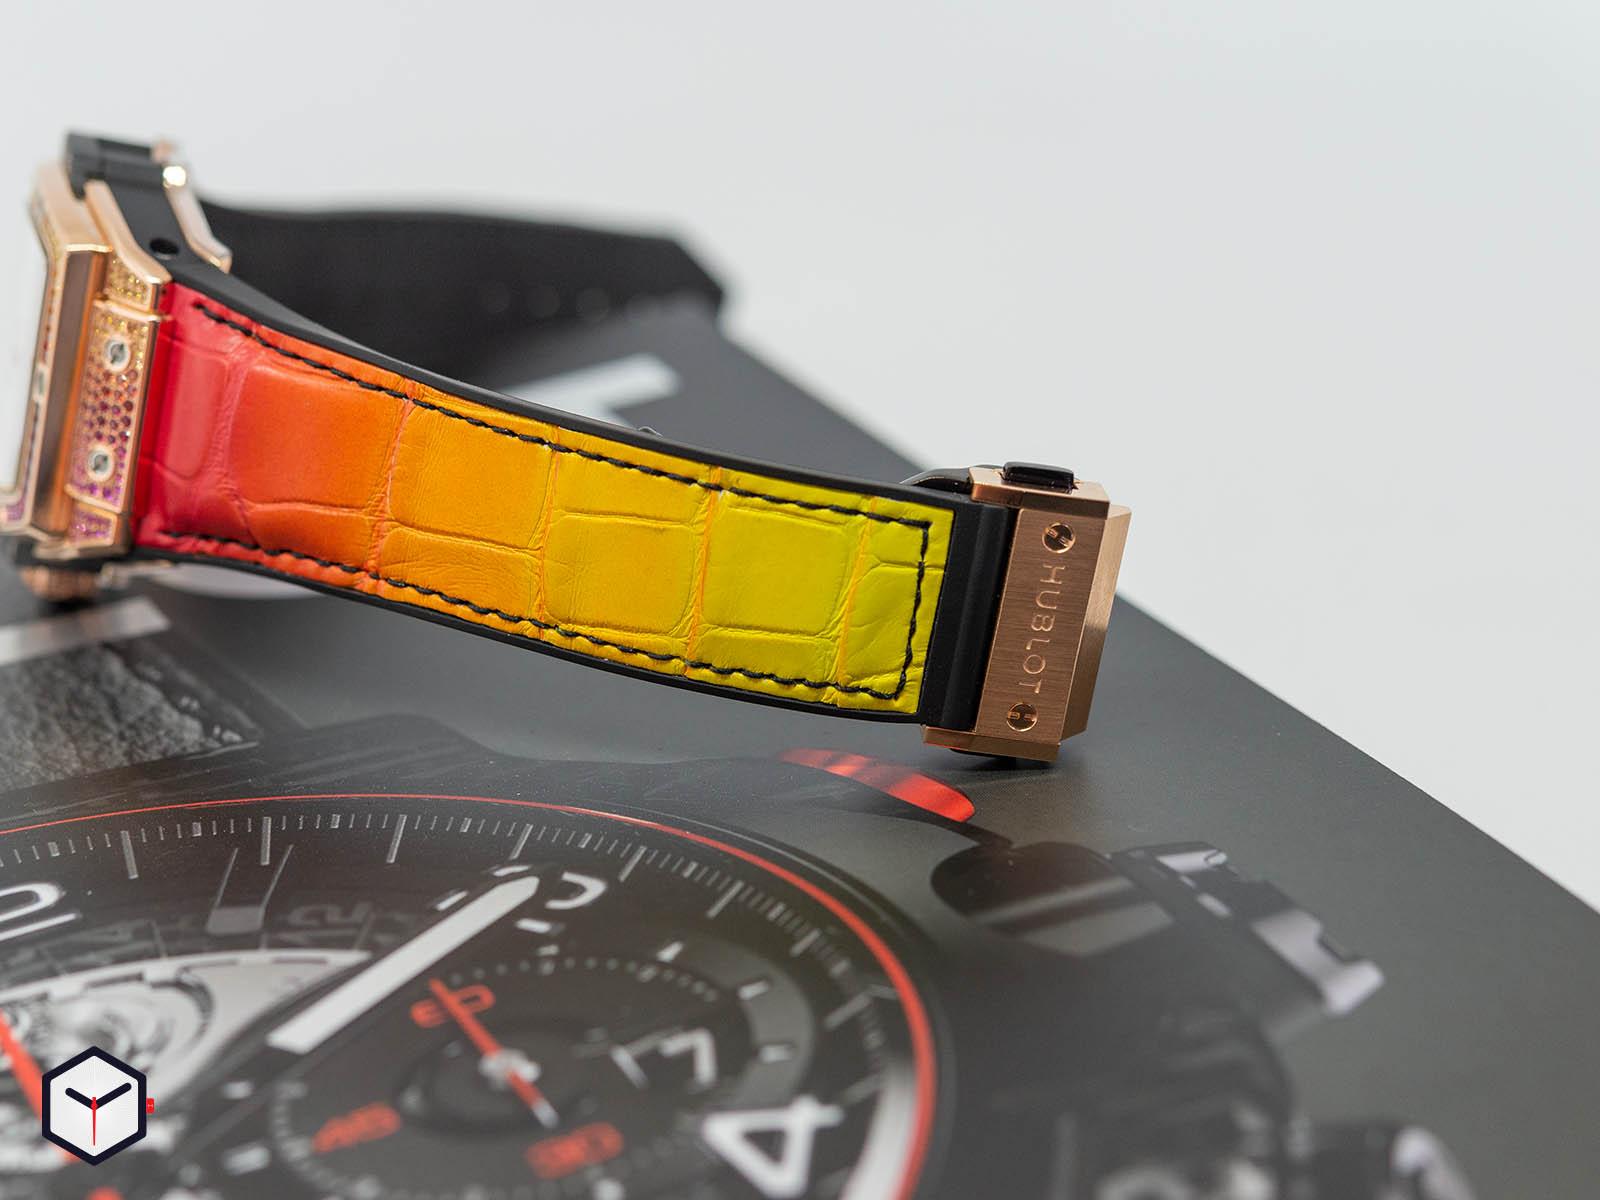 hublot-spirit-of-big-bang-king-gold-rainbow-39-mm-42mm-3.jpg